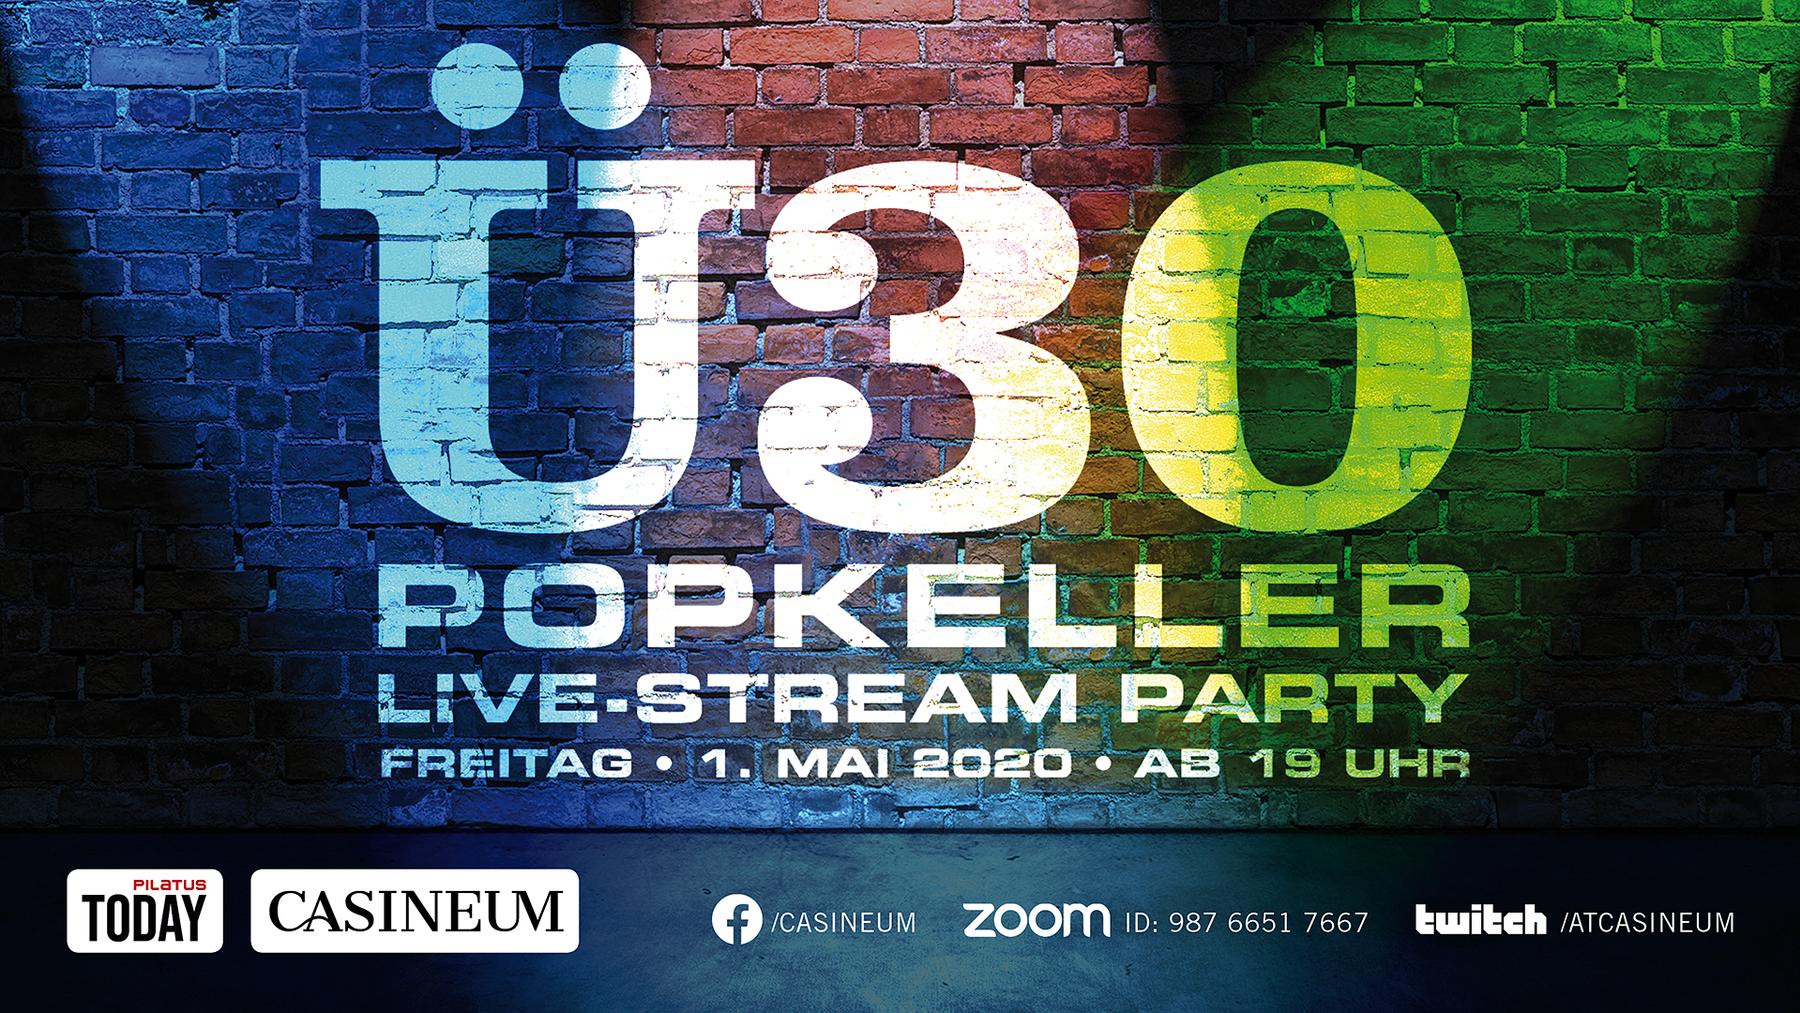 Ü30 Popkeller Hit-Party Live-Stream 1. Mai 2020